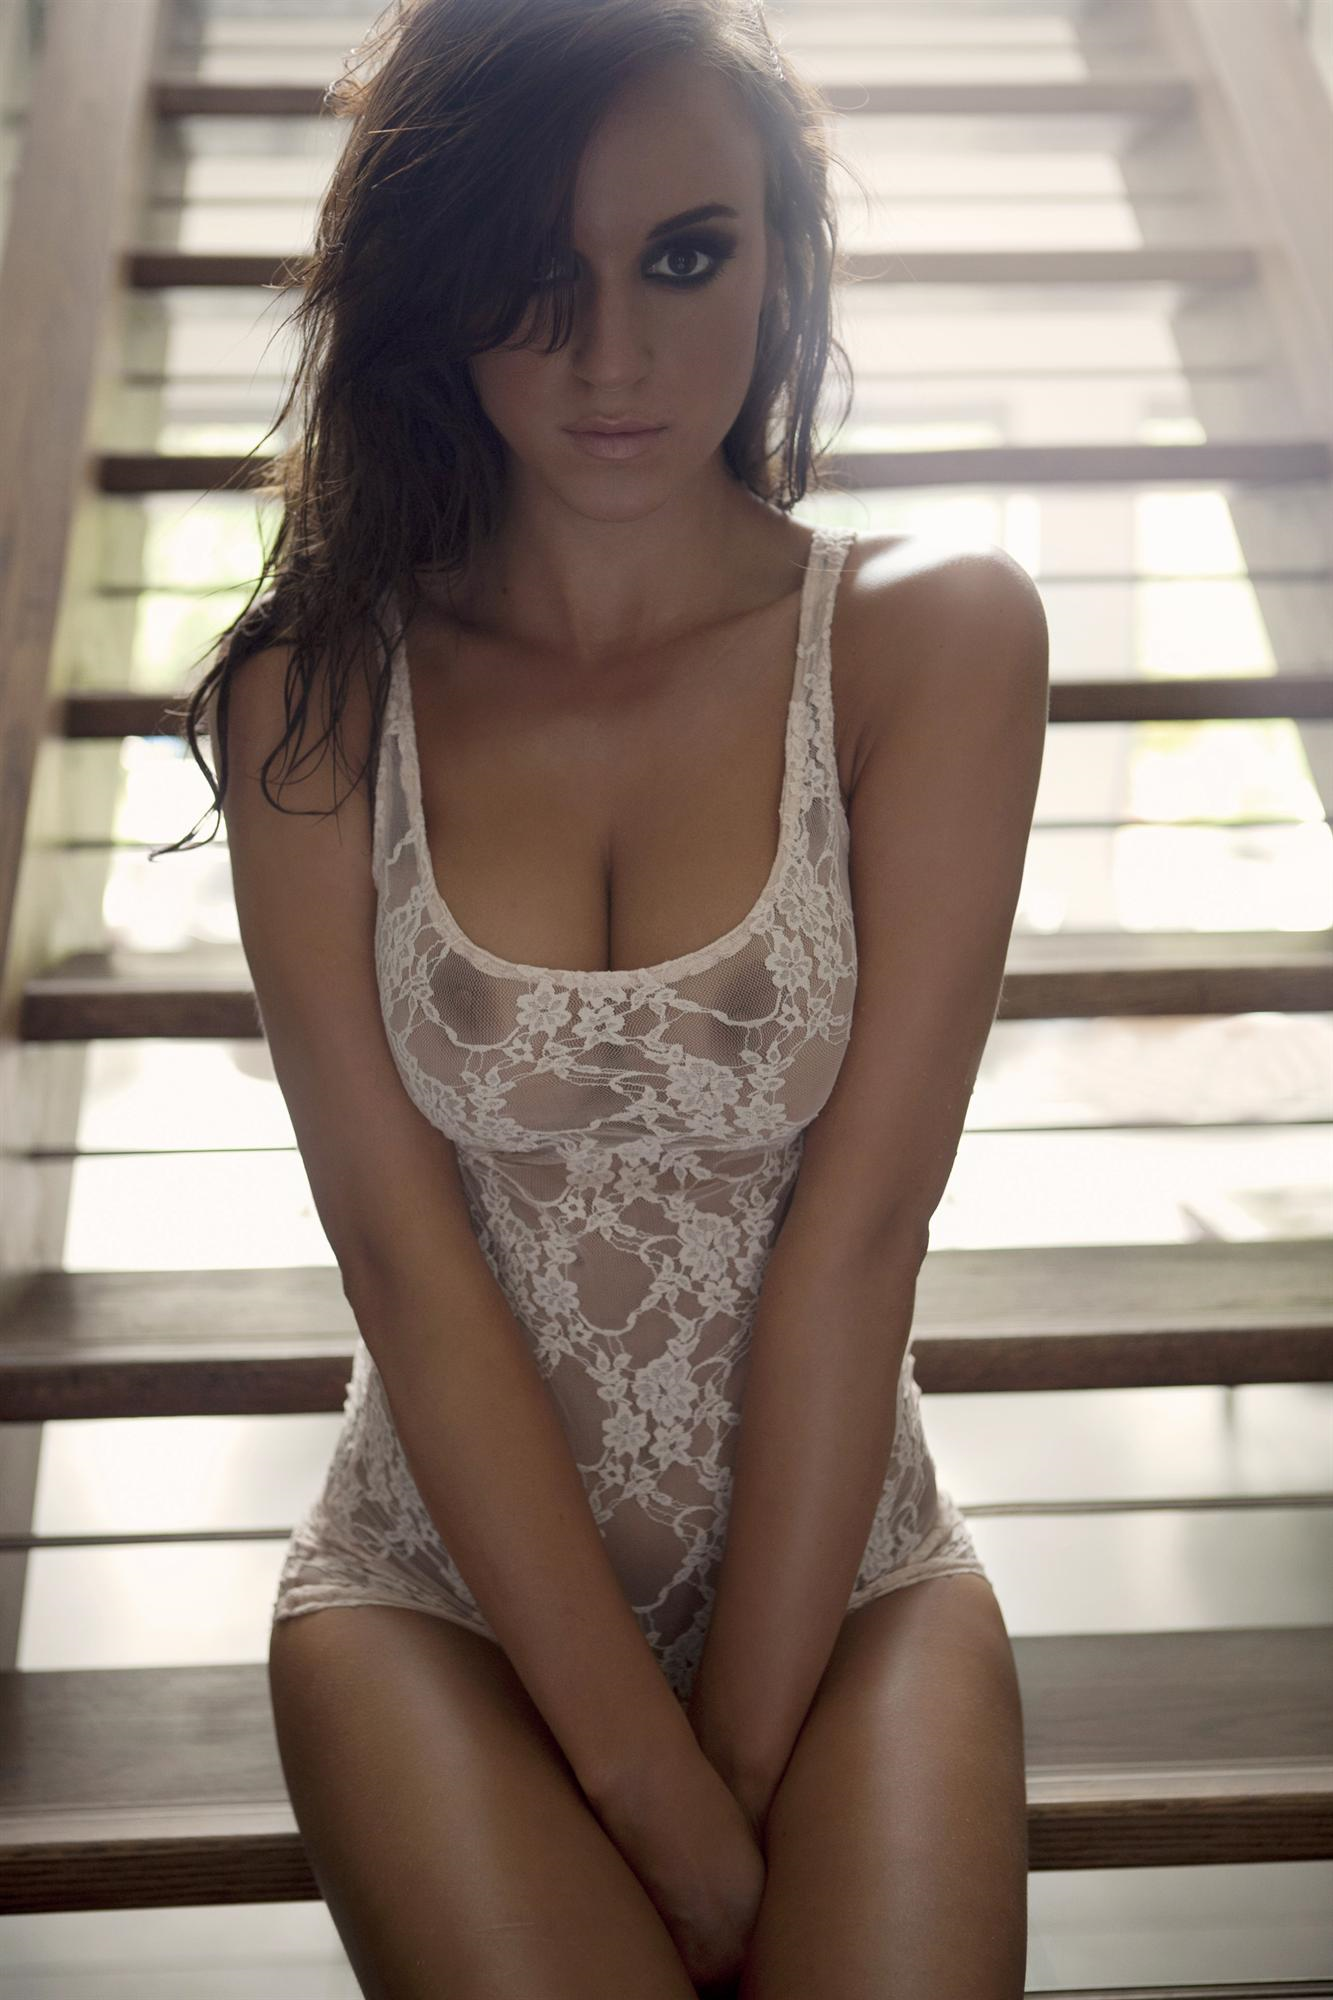 Rosie Jones in lingerie - breasts